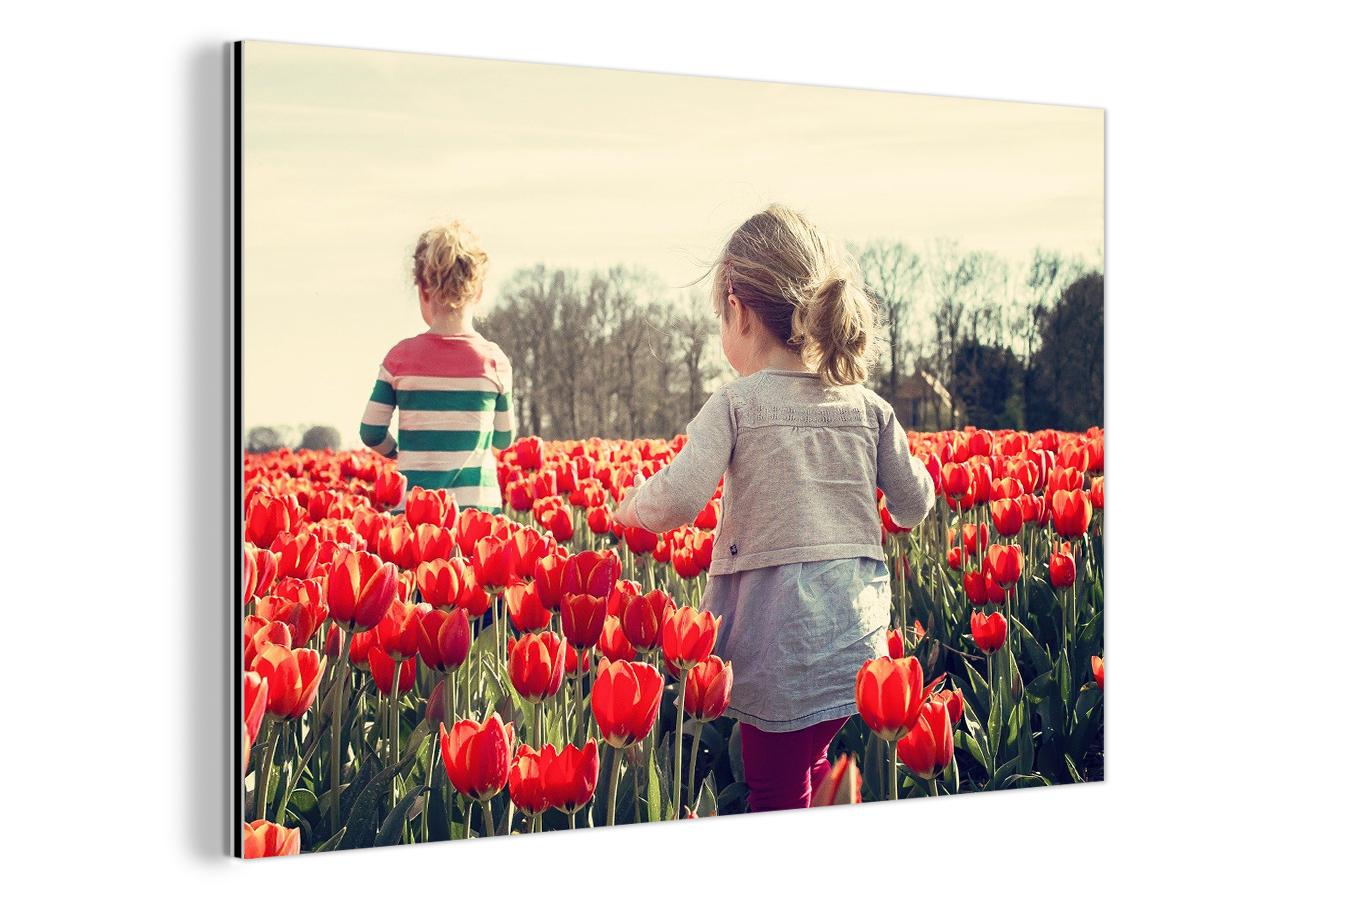 68% korting op standaardprijs eigen foto op aluminium - v.a. €3,12